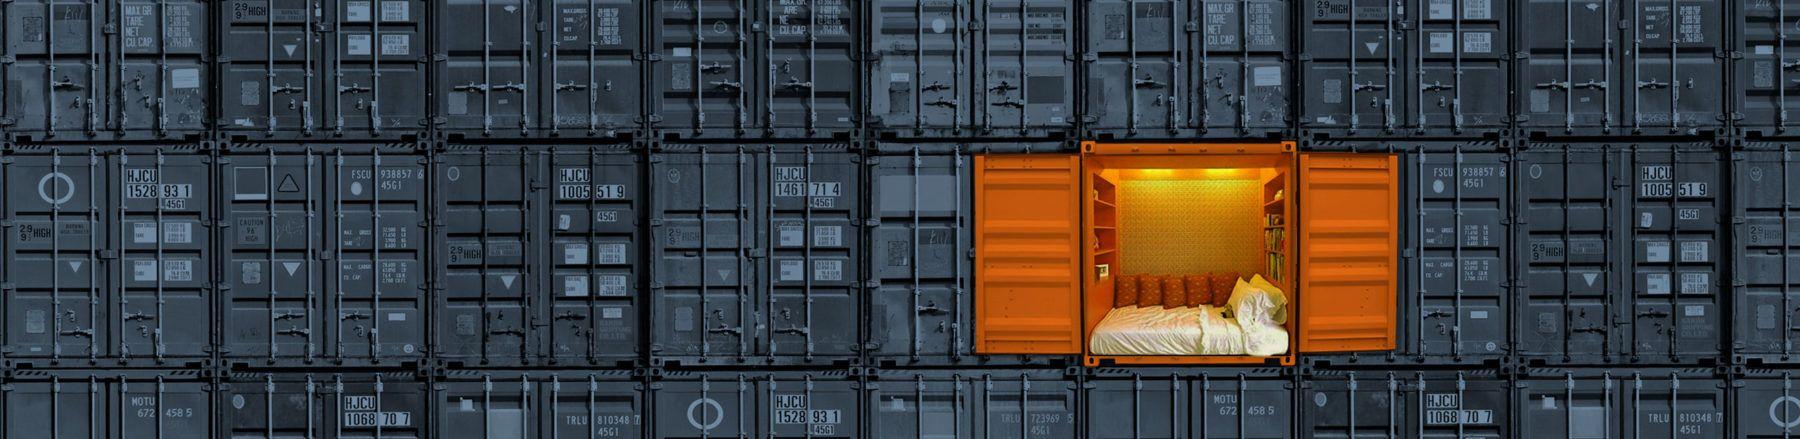 Mouvbox france achat vente et location de containers for Achat container d occasion